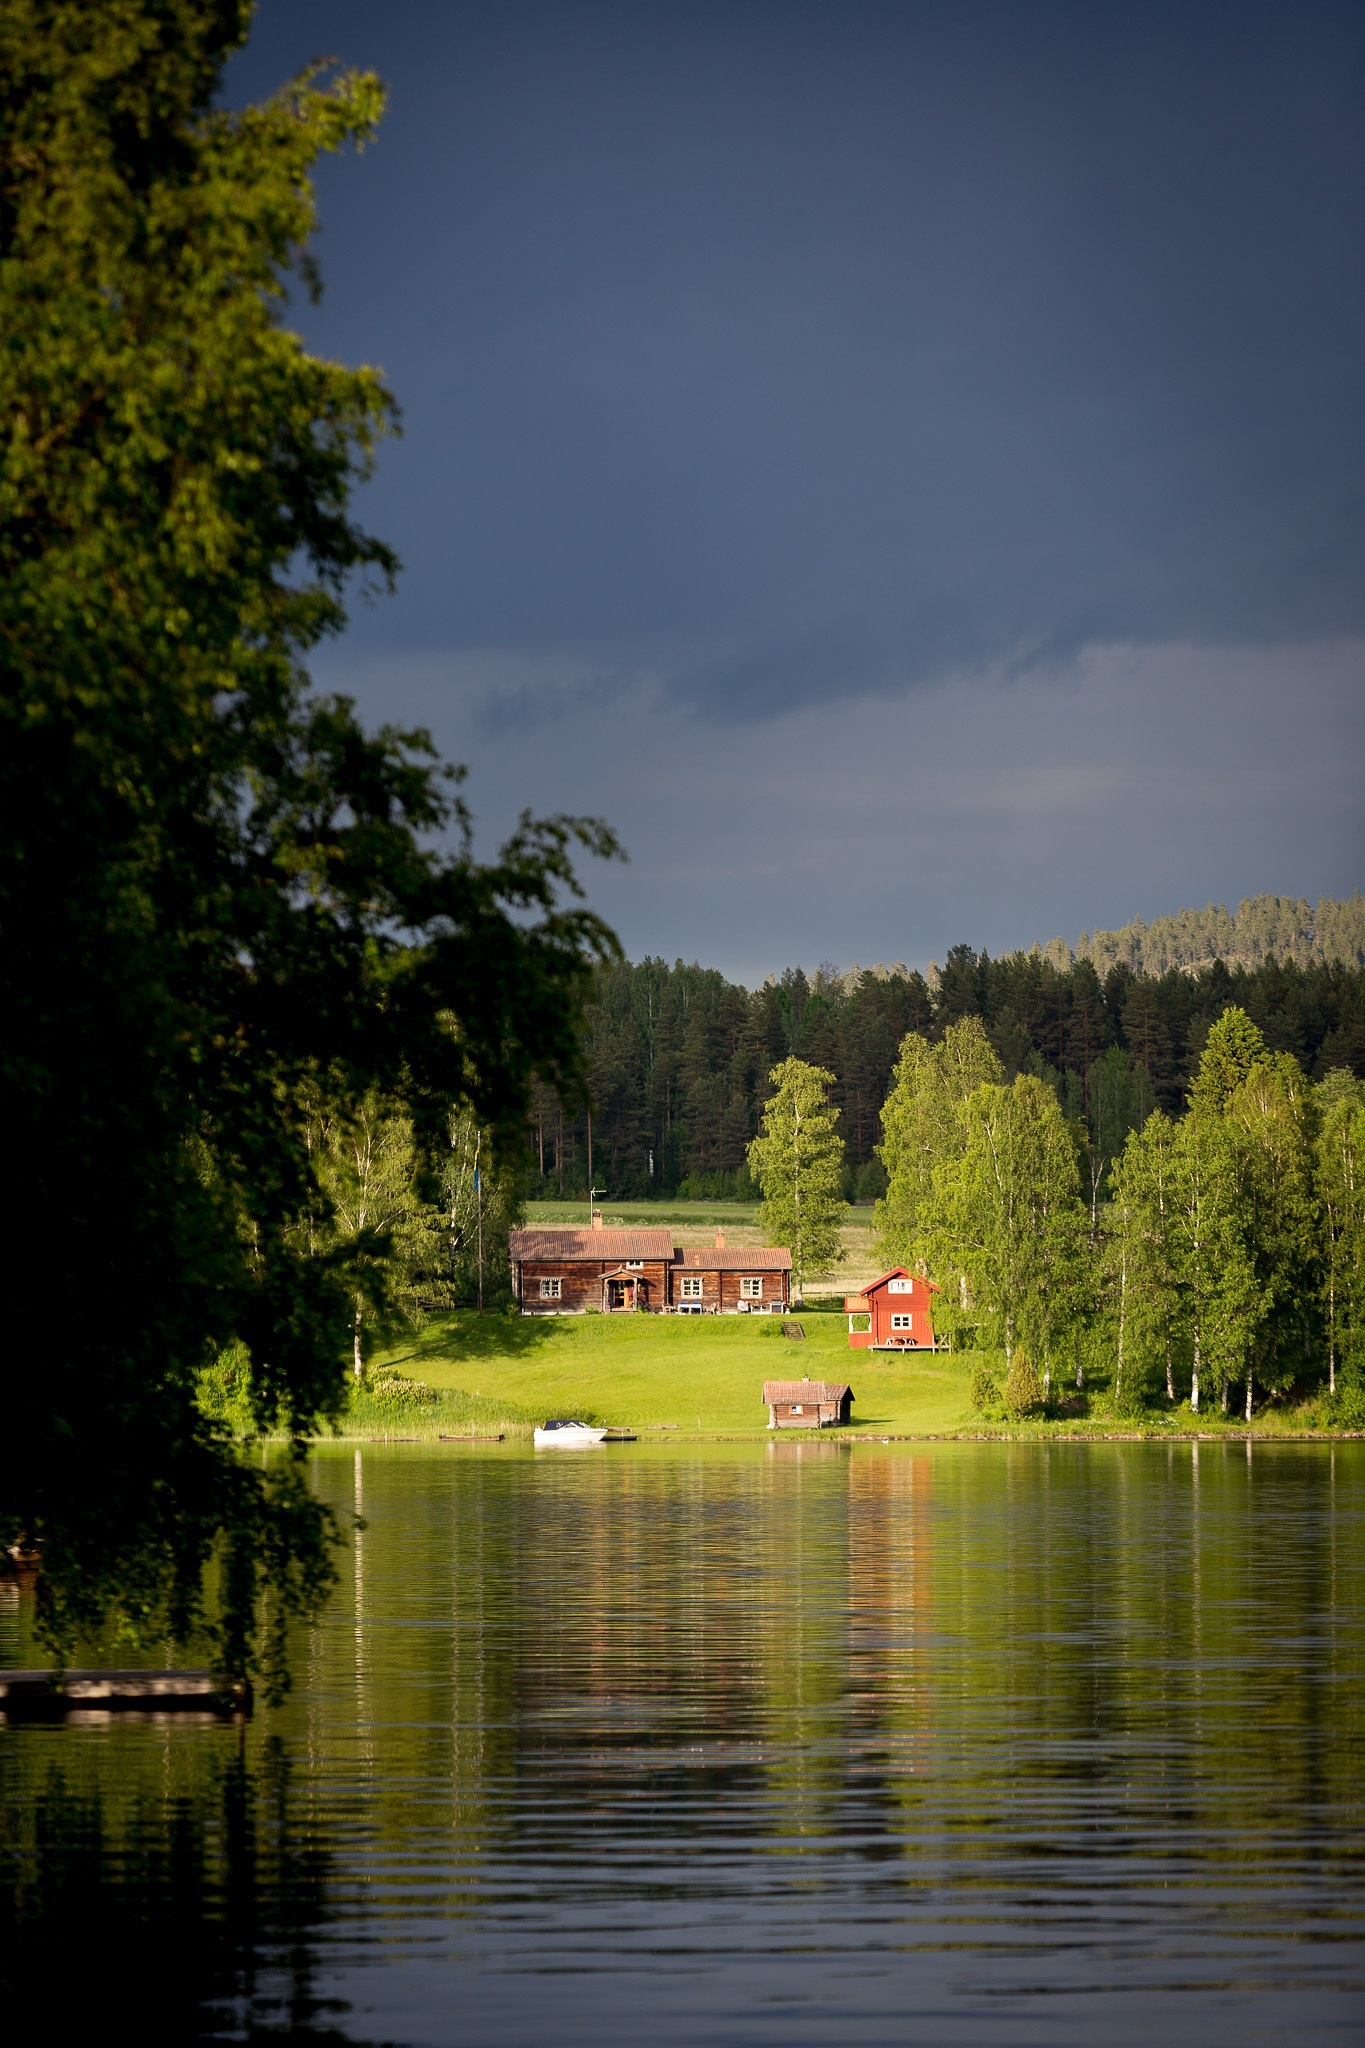 Dala river by bykov68